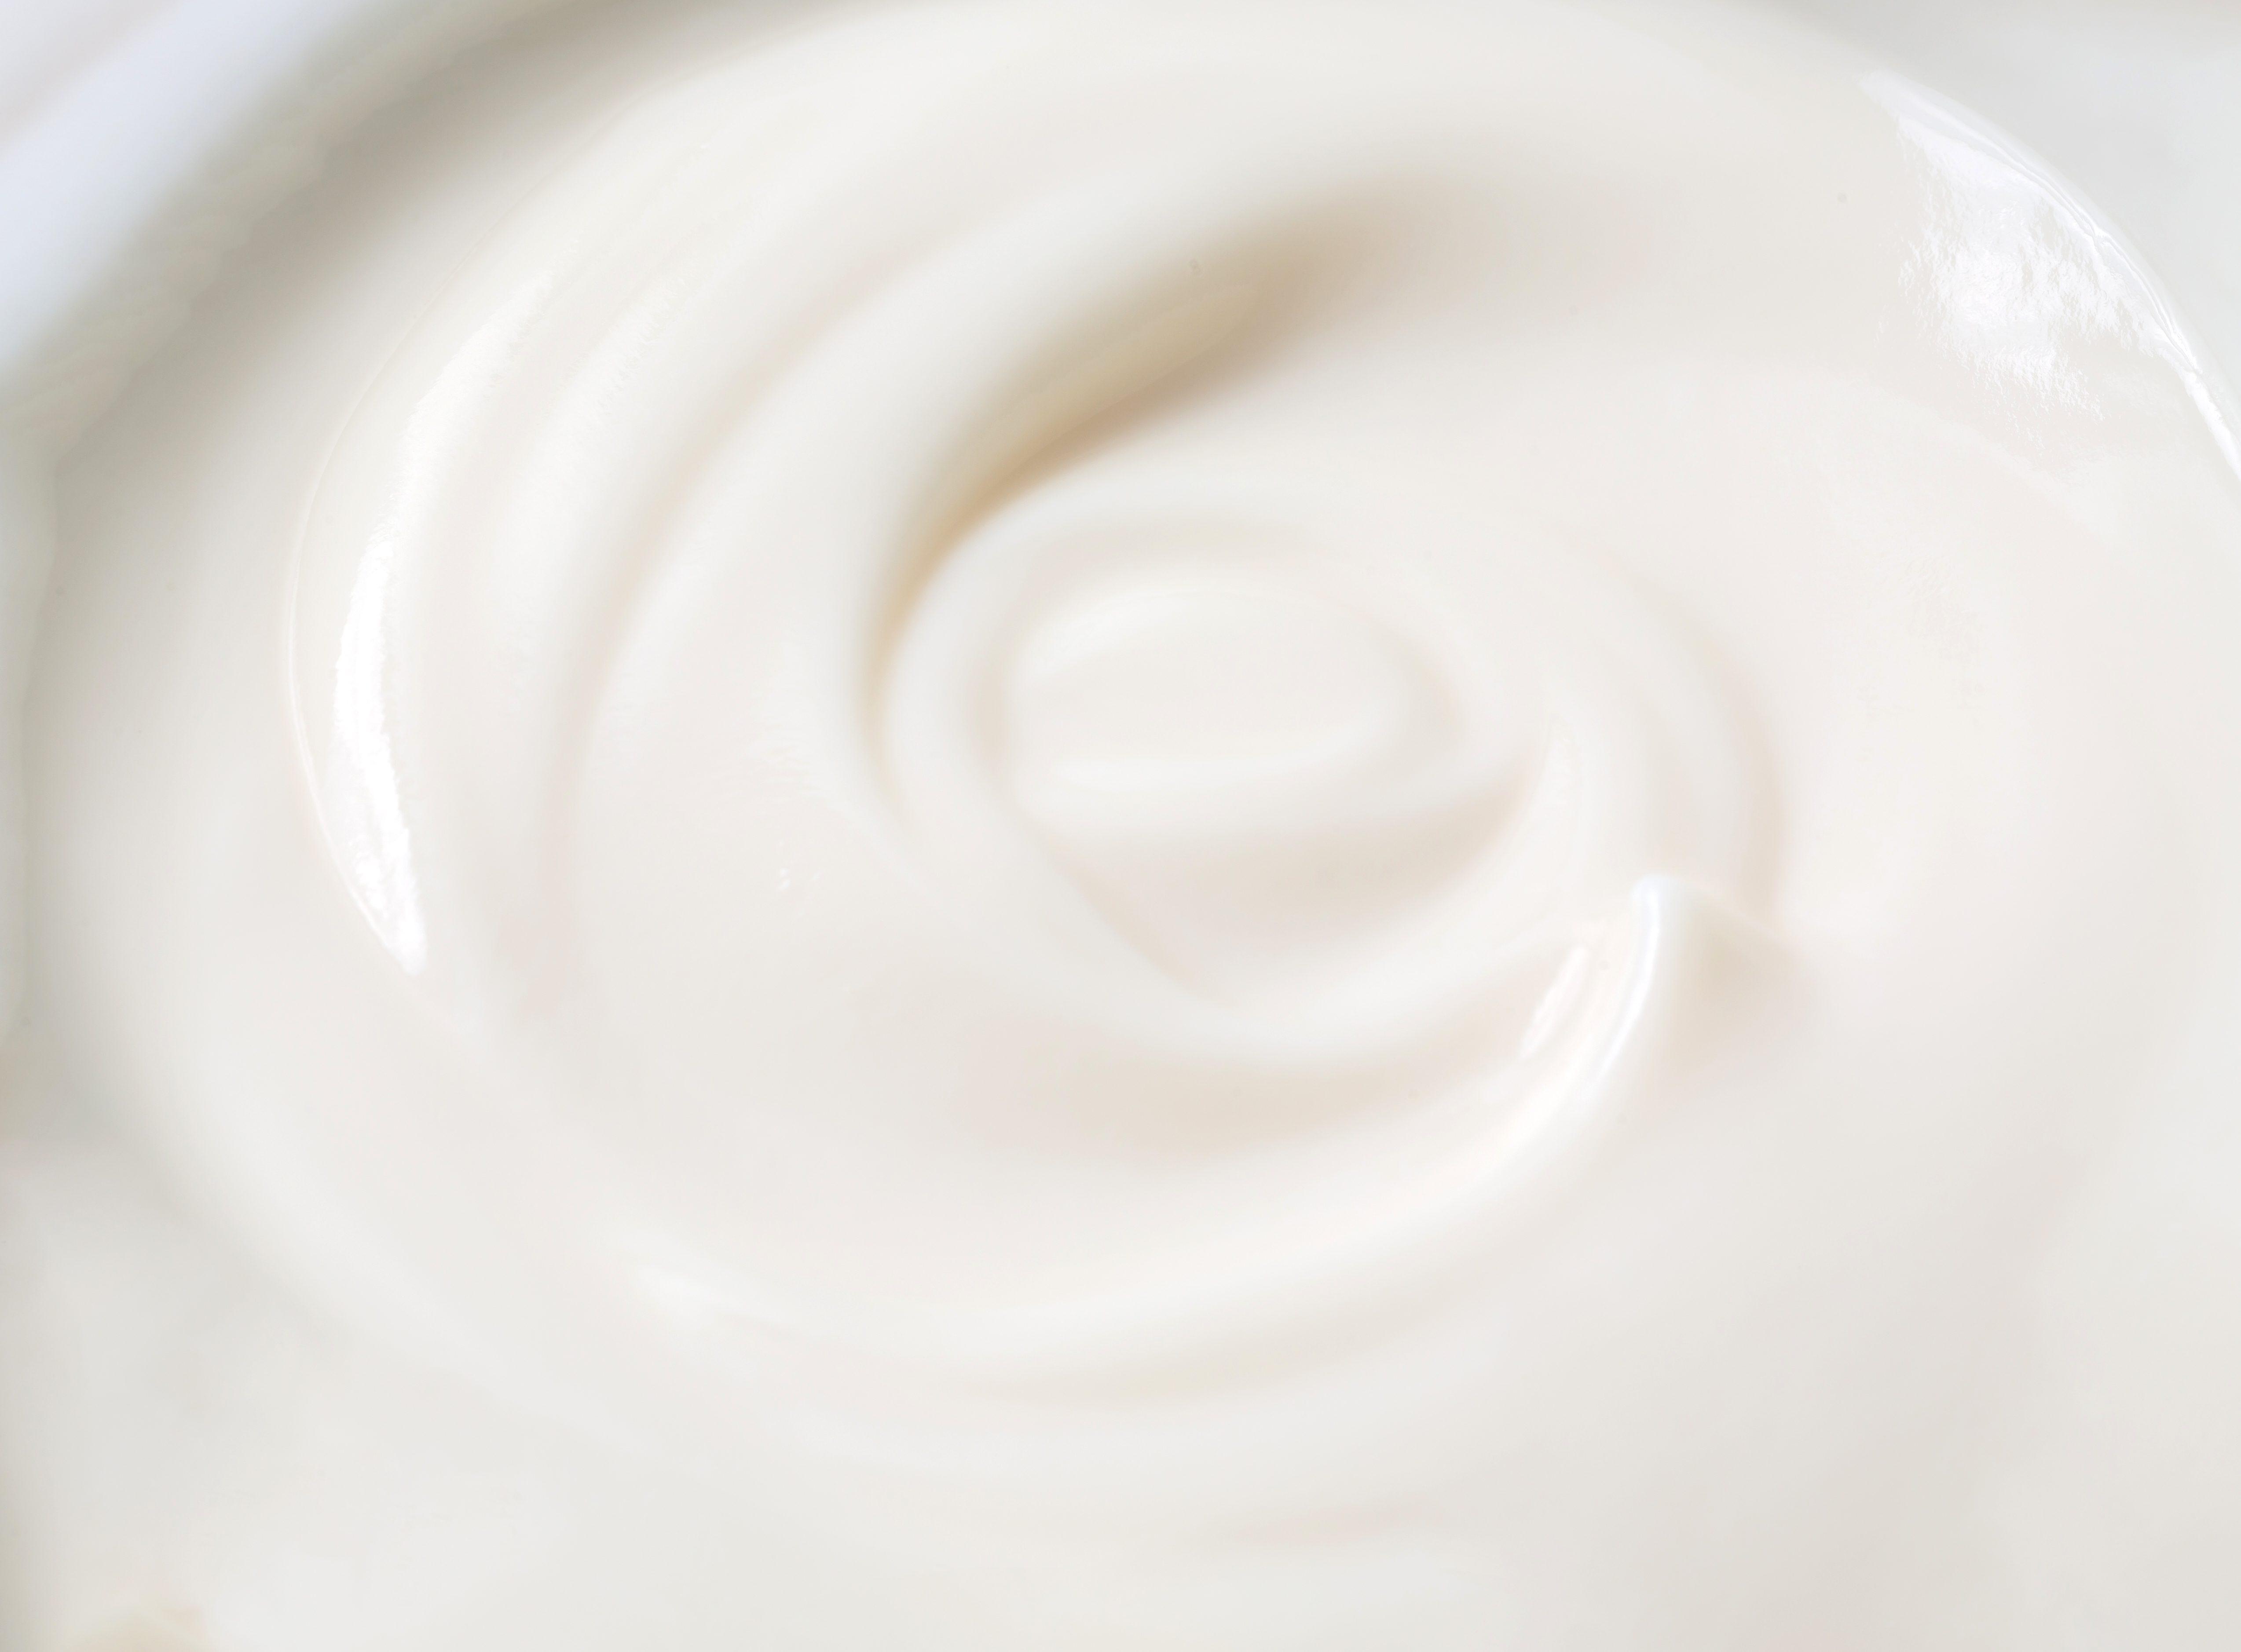 Yogurt. Close up of greek creamy, yogurt texture background.